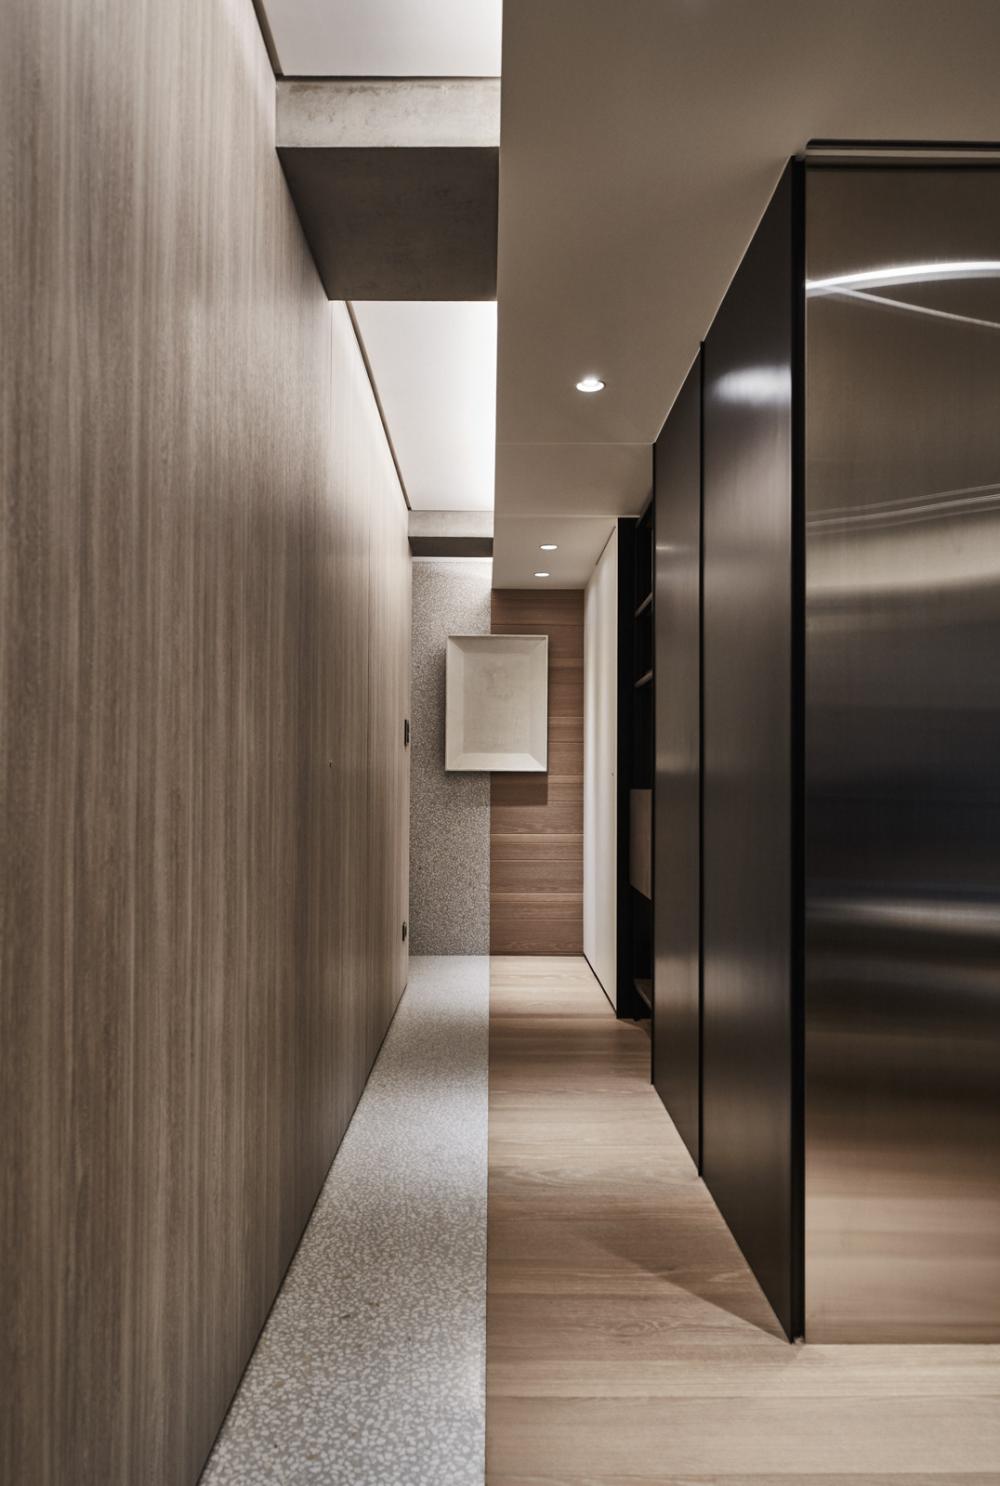 one work design|subtle on behance | Офисные проекты, Интерьер, Дизайн офиса